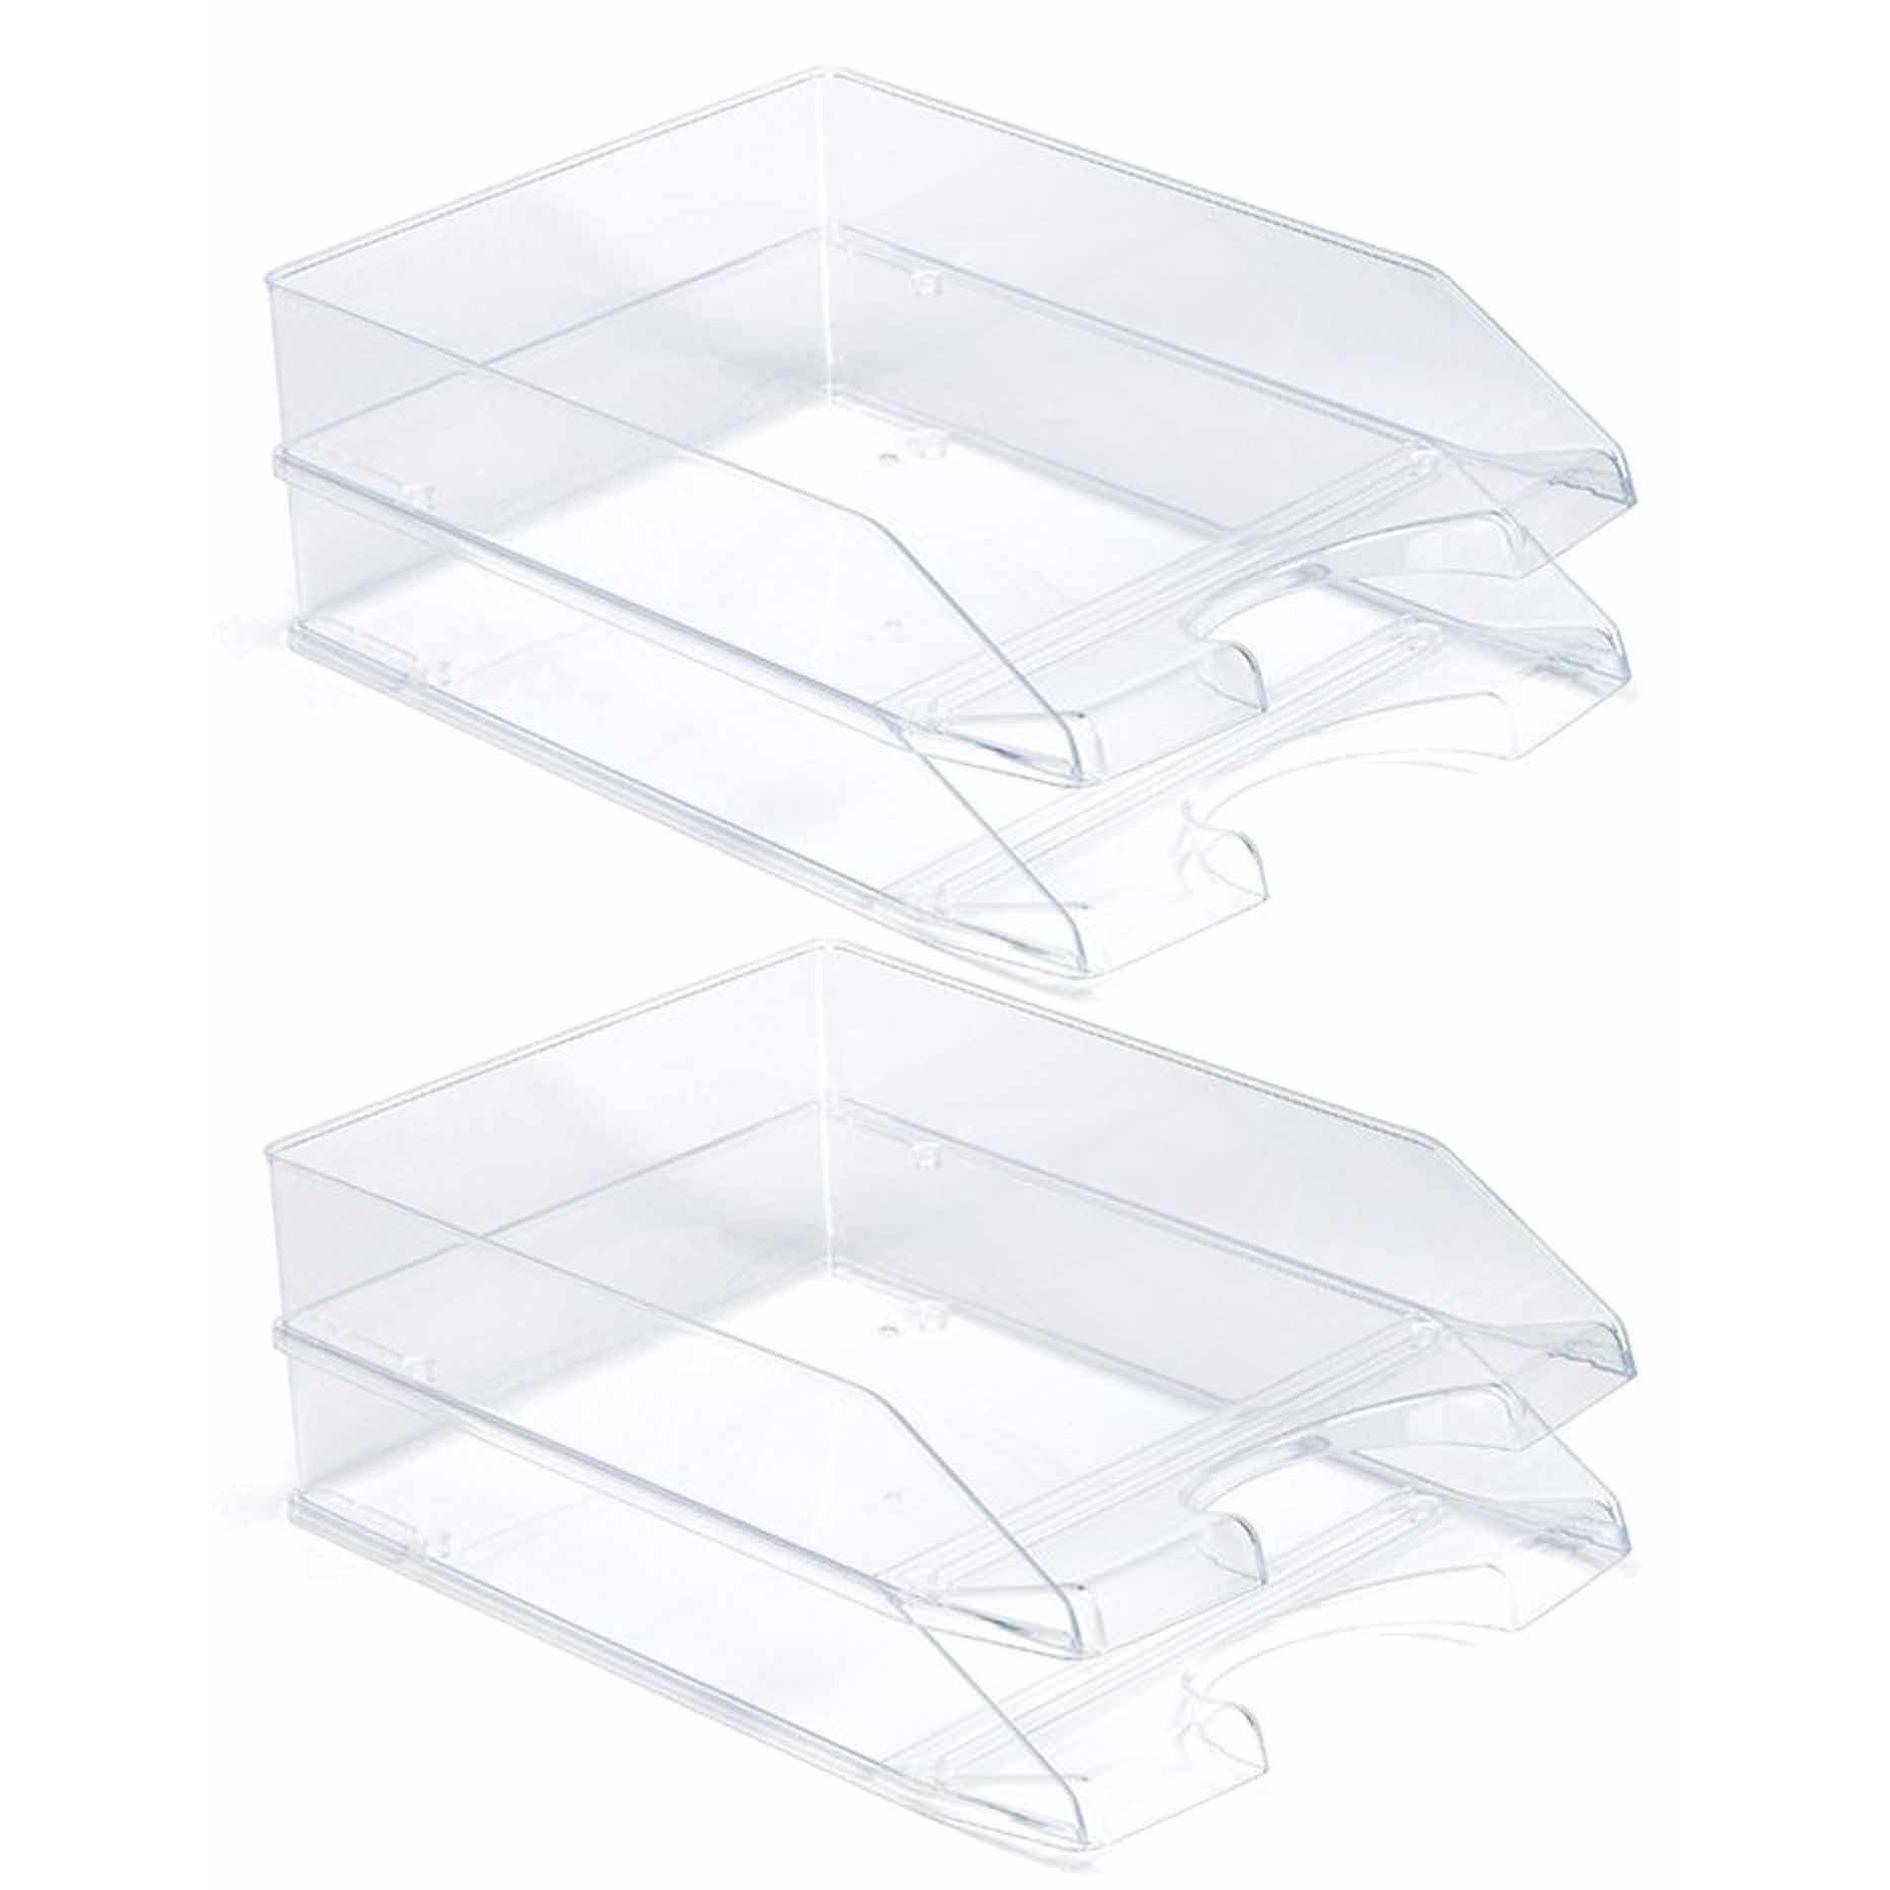 Pakket van 10x stuks postbakjejes transparant a4 formaat